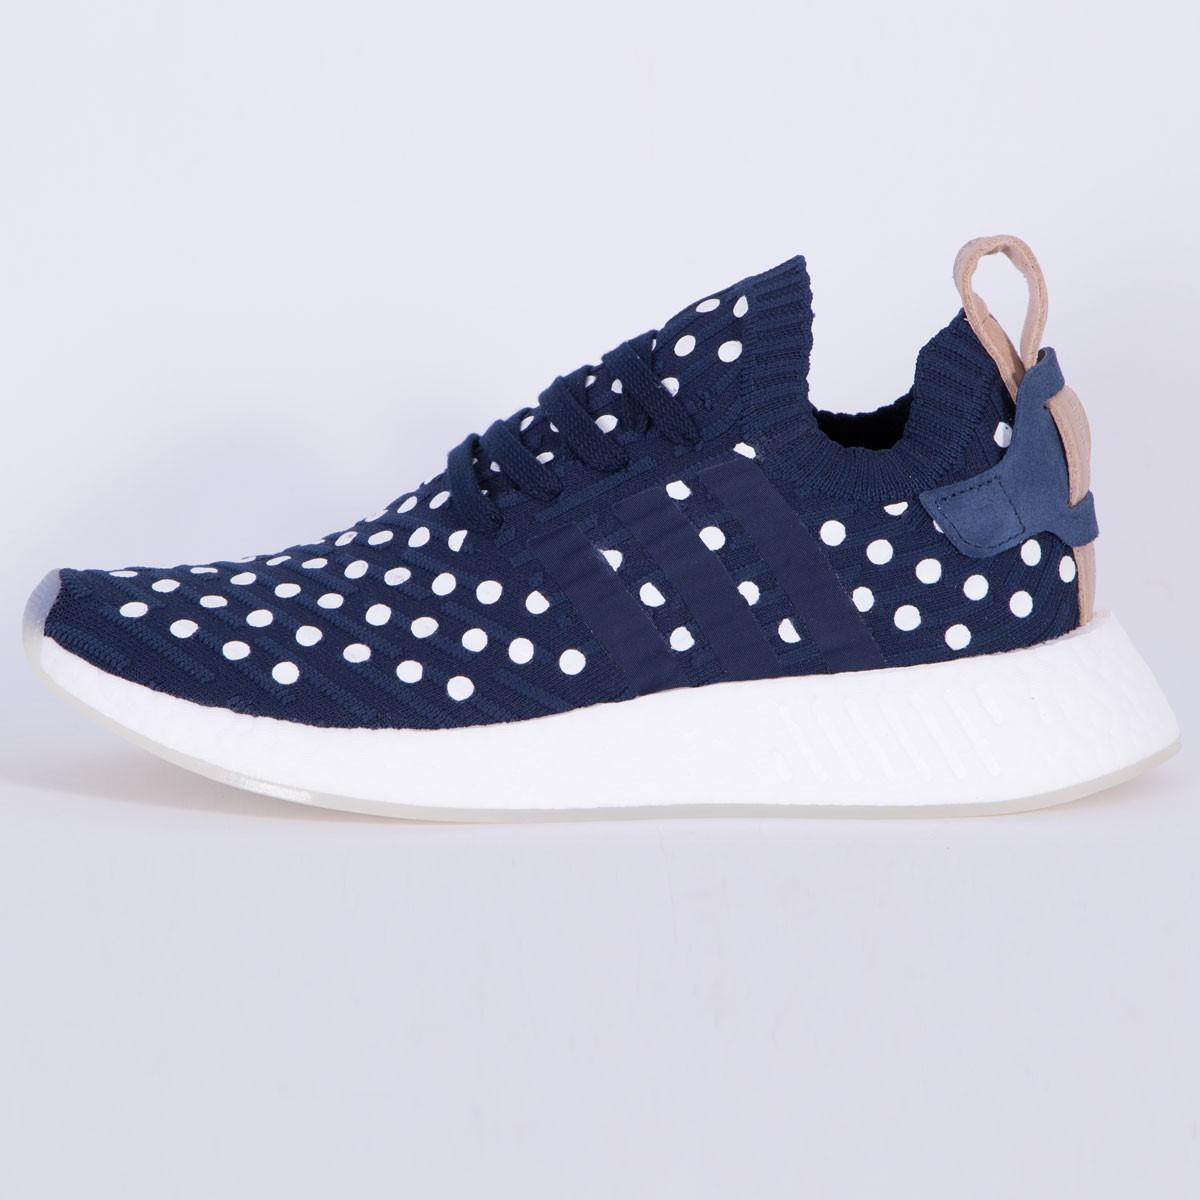 Adidas Original Snm Moody [NMD_R 2 PK W]